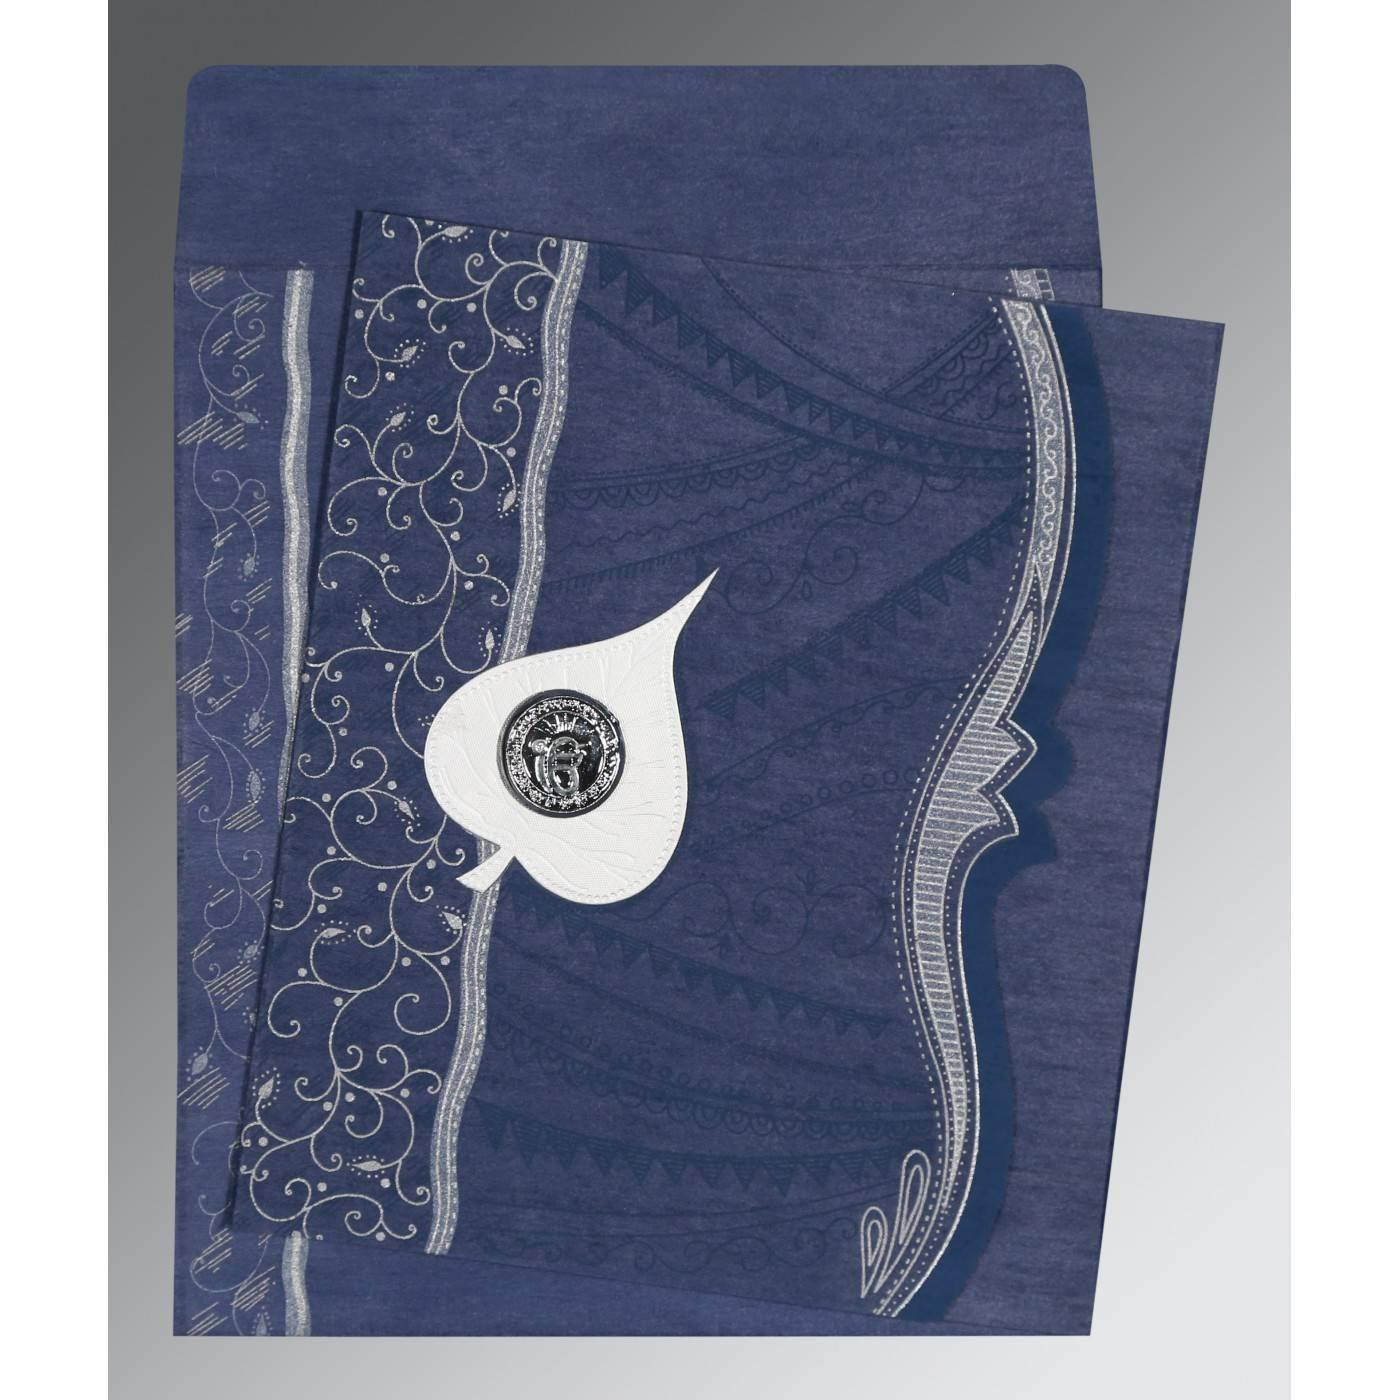 INDIGO BLUE SHIMMERY EMBOSSED WEDDING CARD : CRU-8210H - IndianWeddingCards